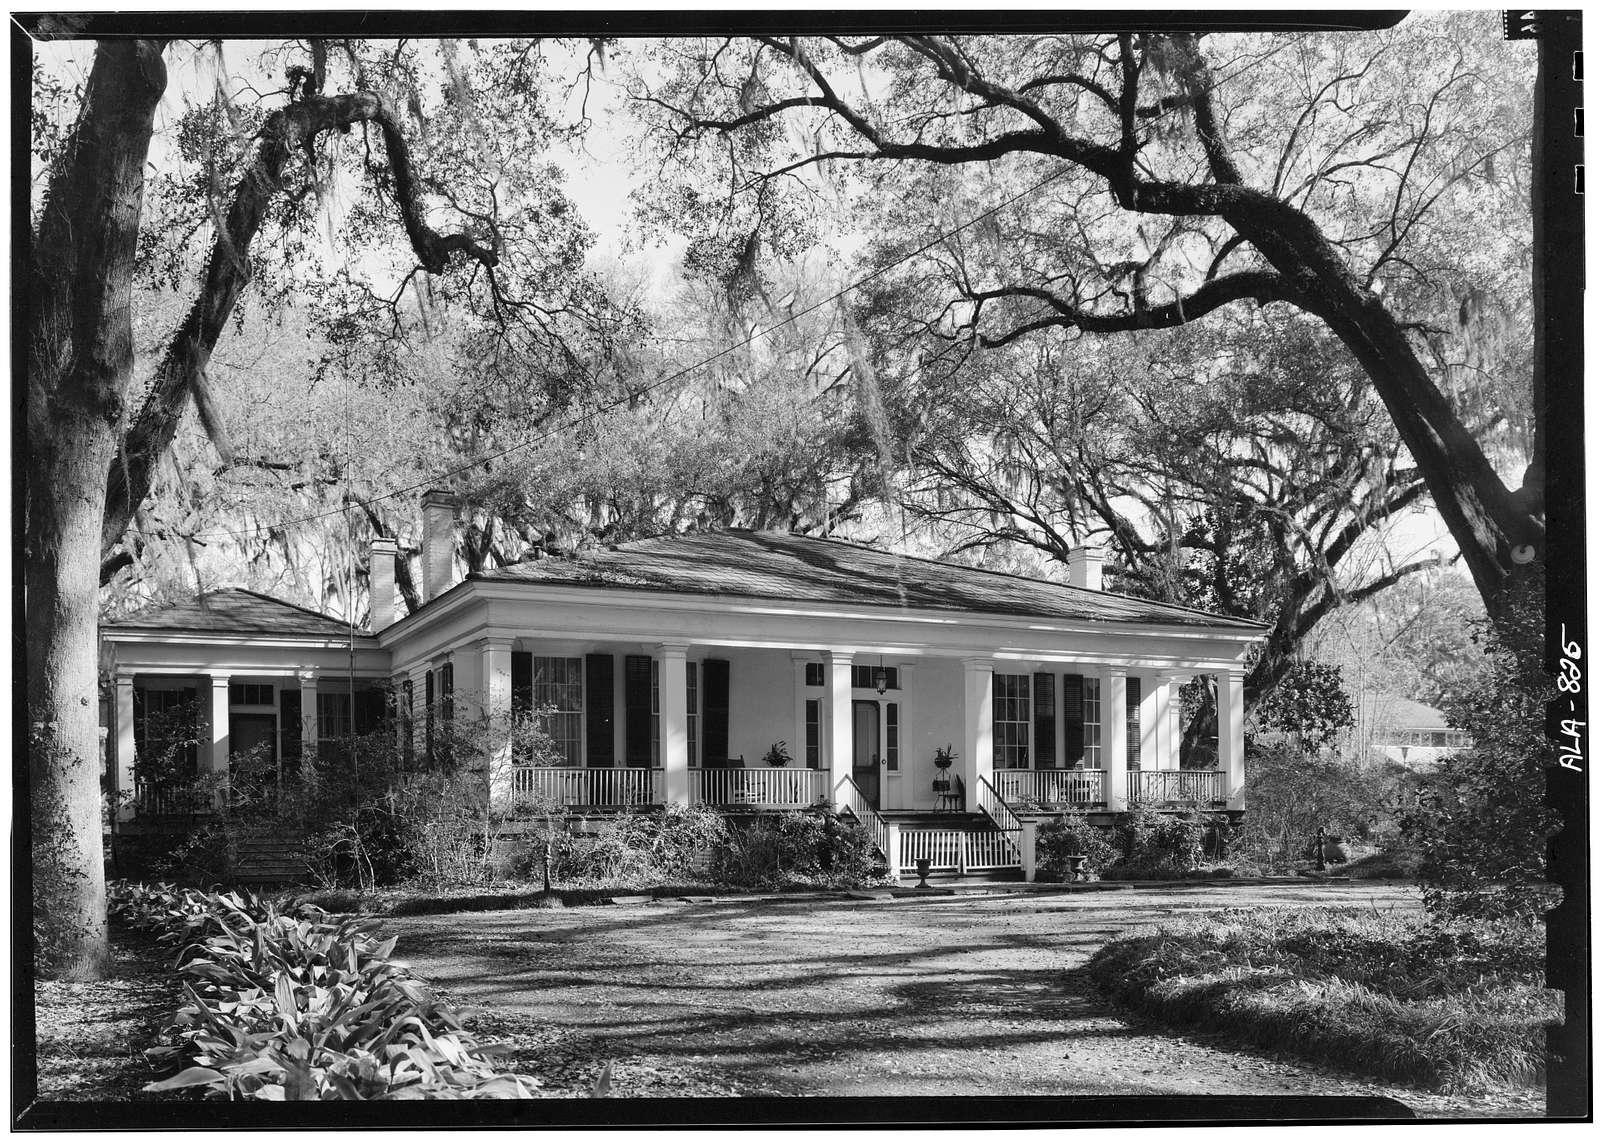 Hardaway-Evans-Wilson-Sledge House, 2564 Spring Hill Avenue, Mobile, Mobile County, AL